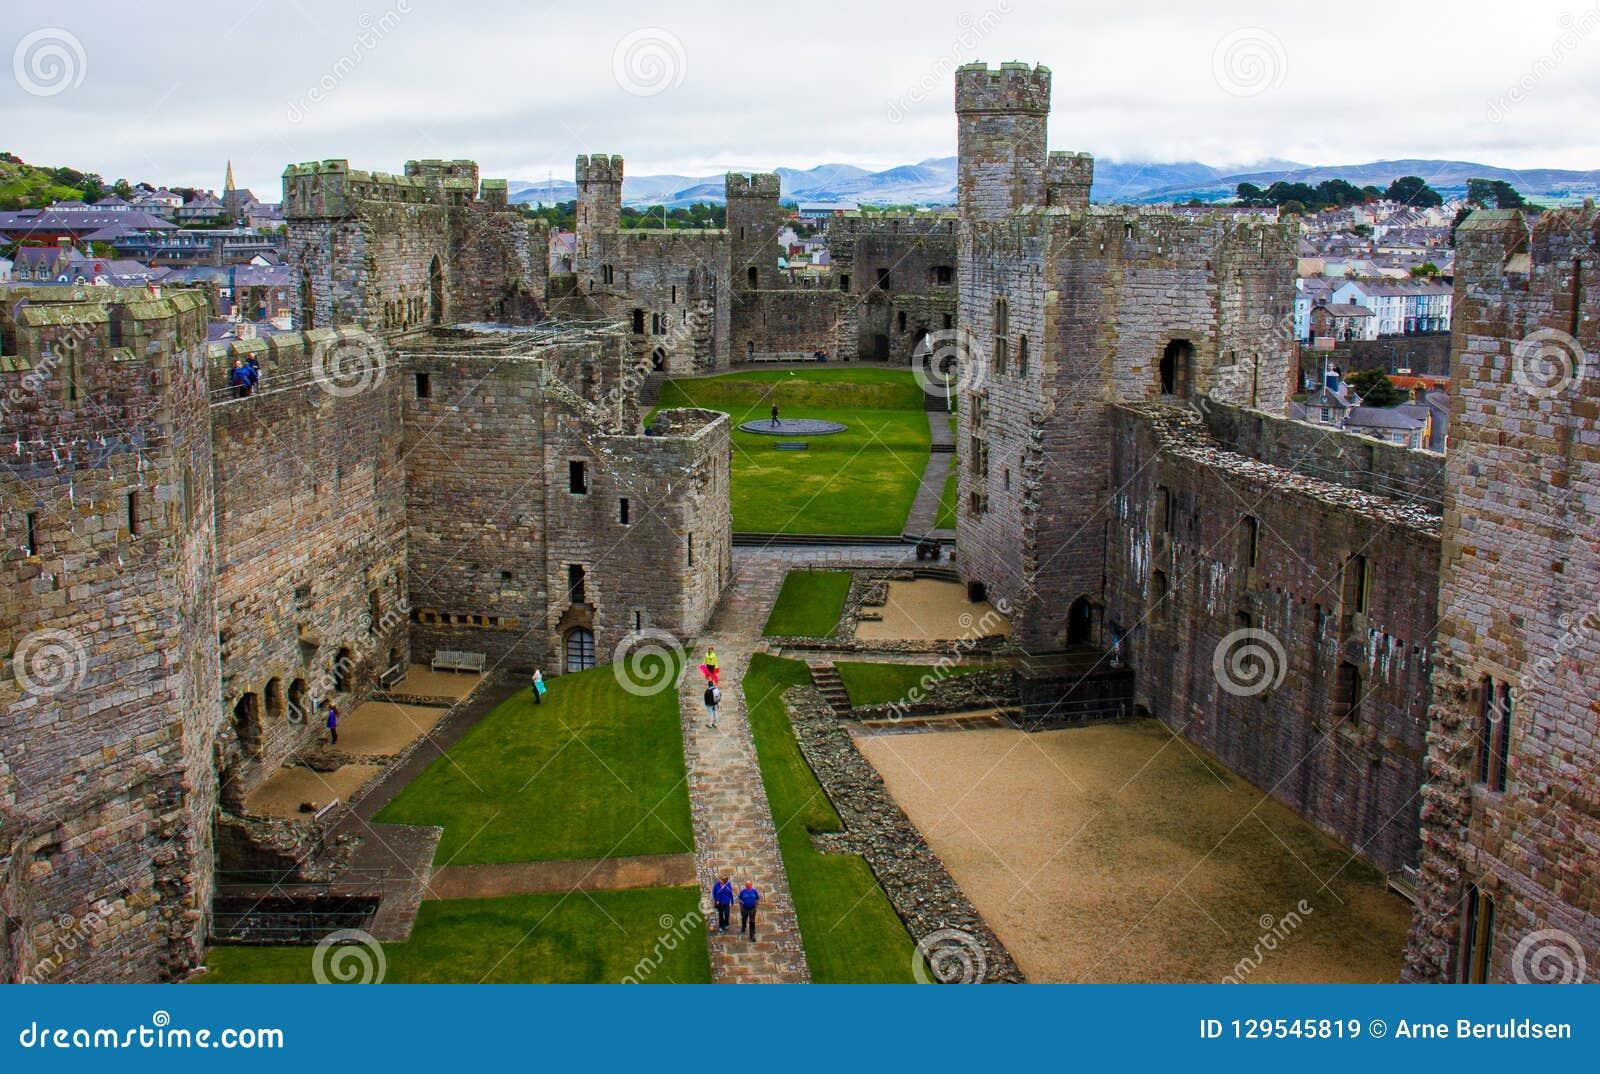 The Interior of Caernarfon Castle